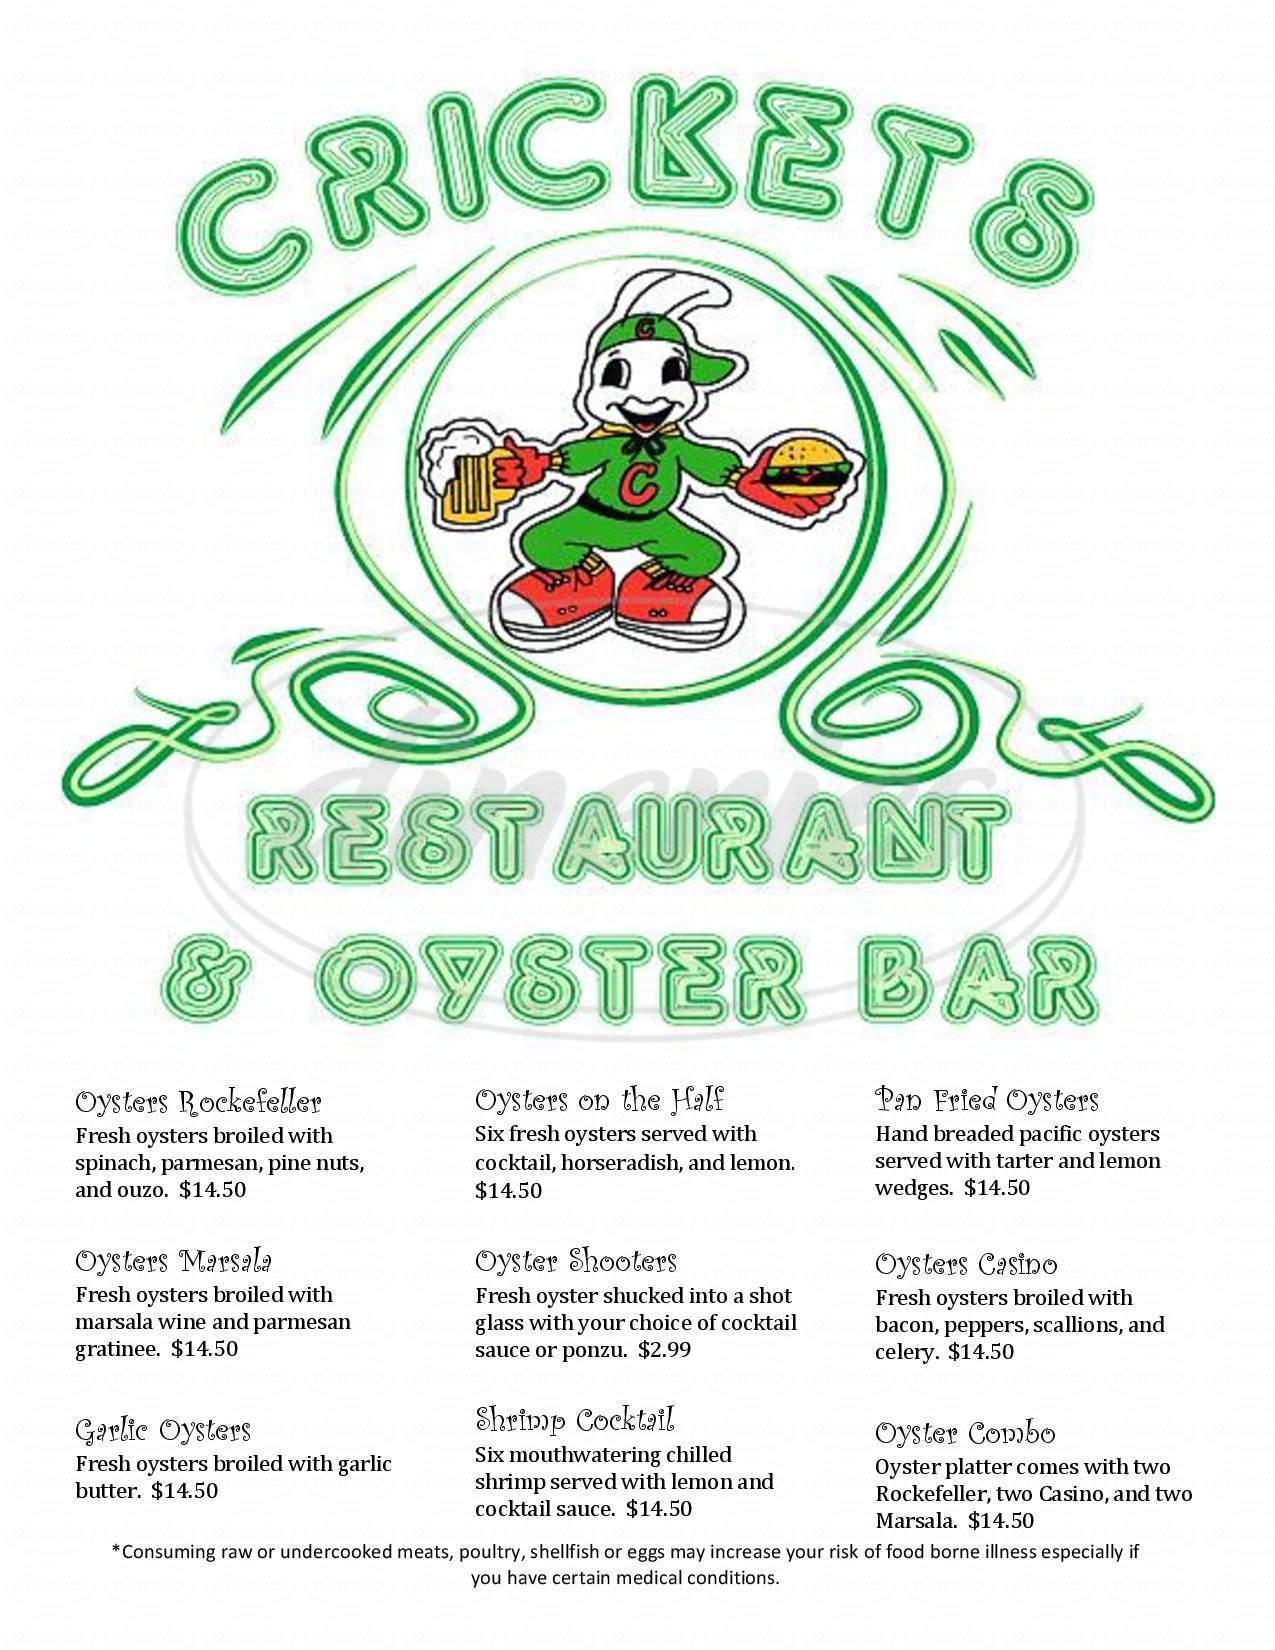 menu for Cricket's Steakhouse & Oyster Bar